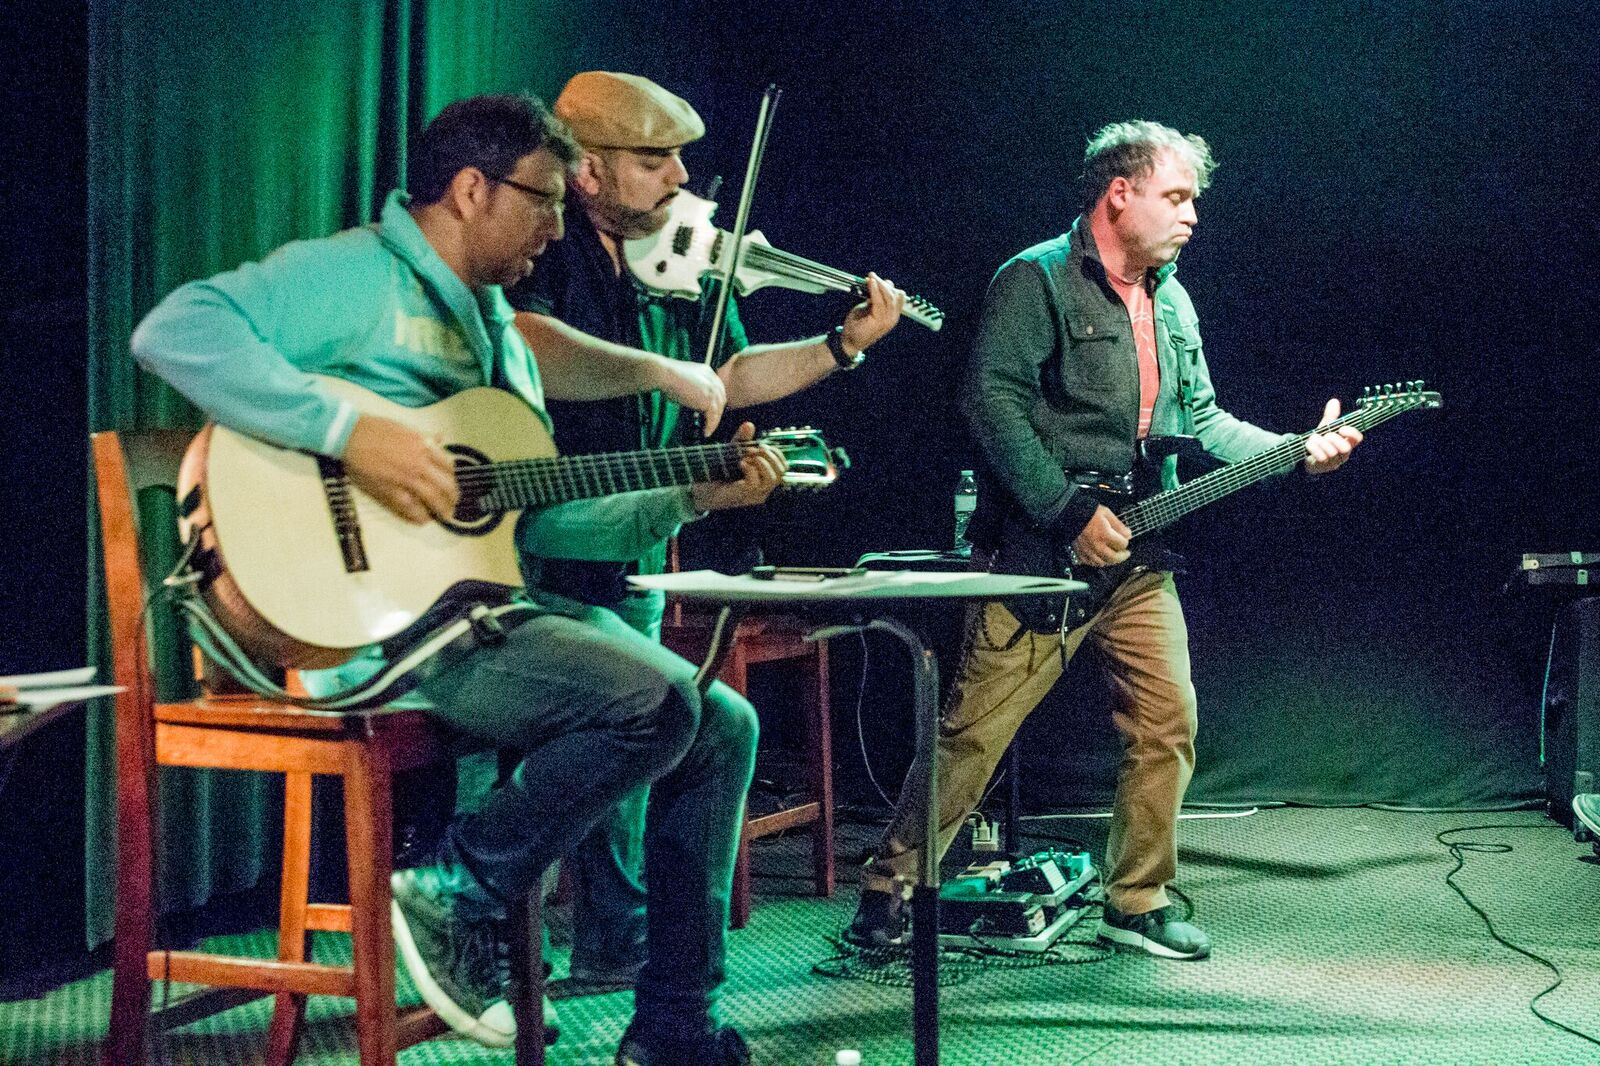 Sean Blackman, Harry Hovakinian, Steve Caldwell. Photo by Dori Sumter